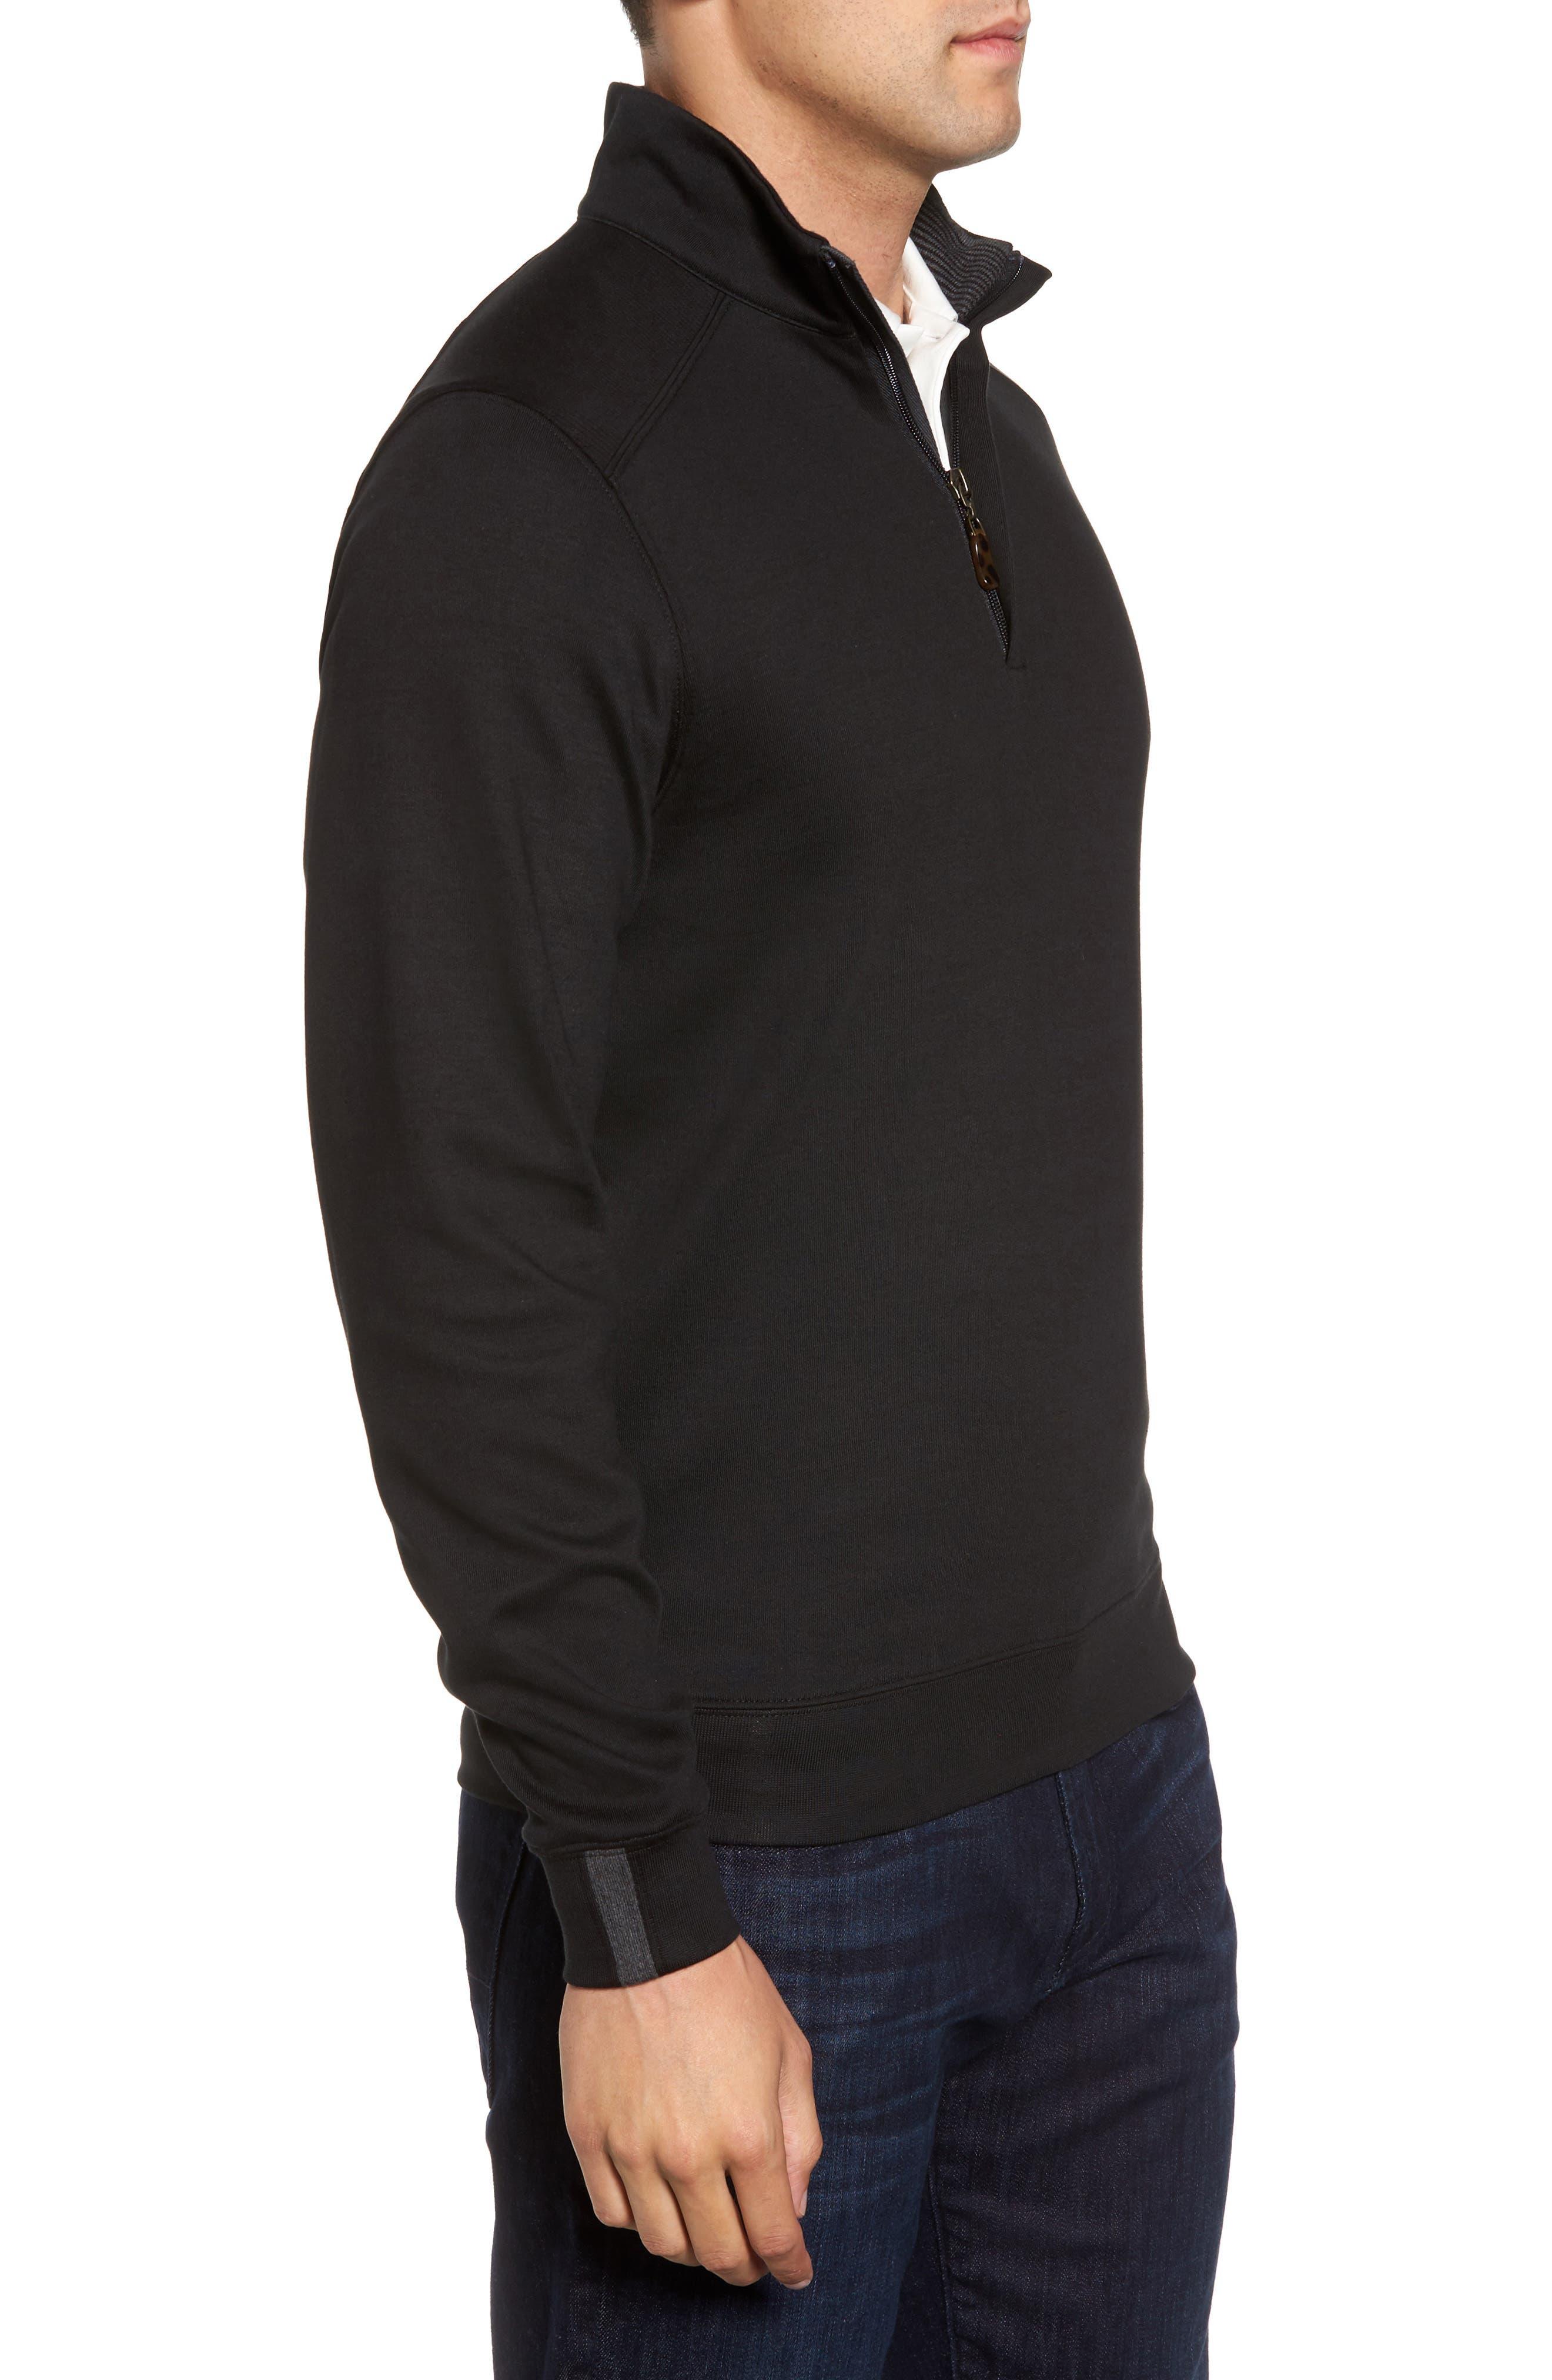 Interlock Knit Quarter Zip Pullover,                             Alternate thumbnail 3, color,                             Black